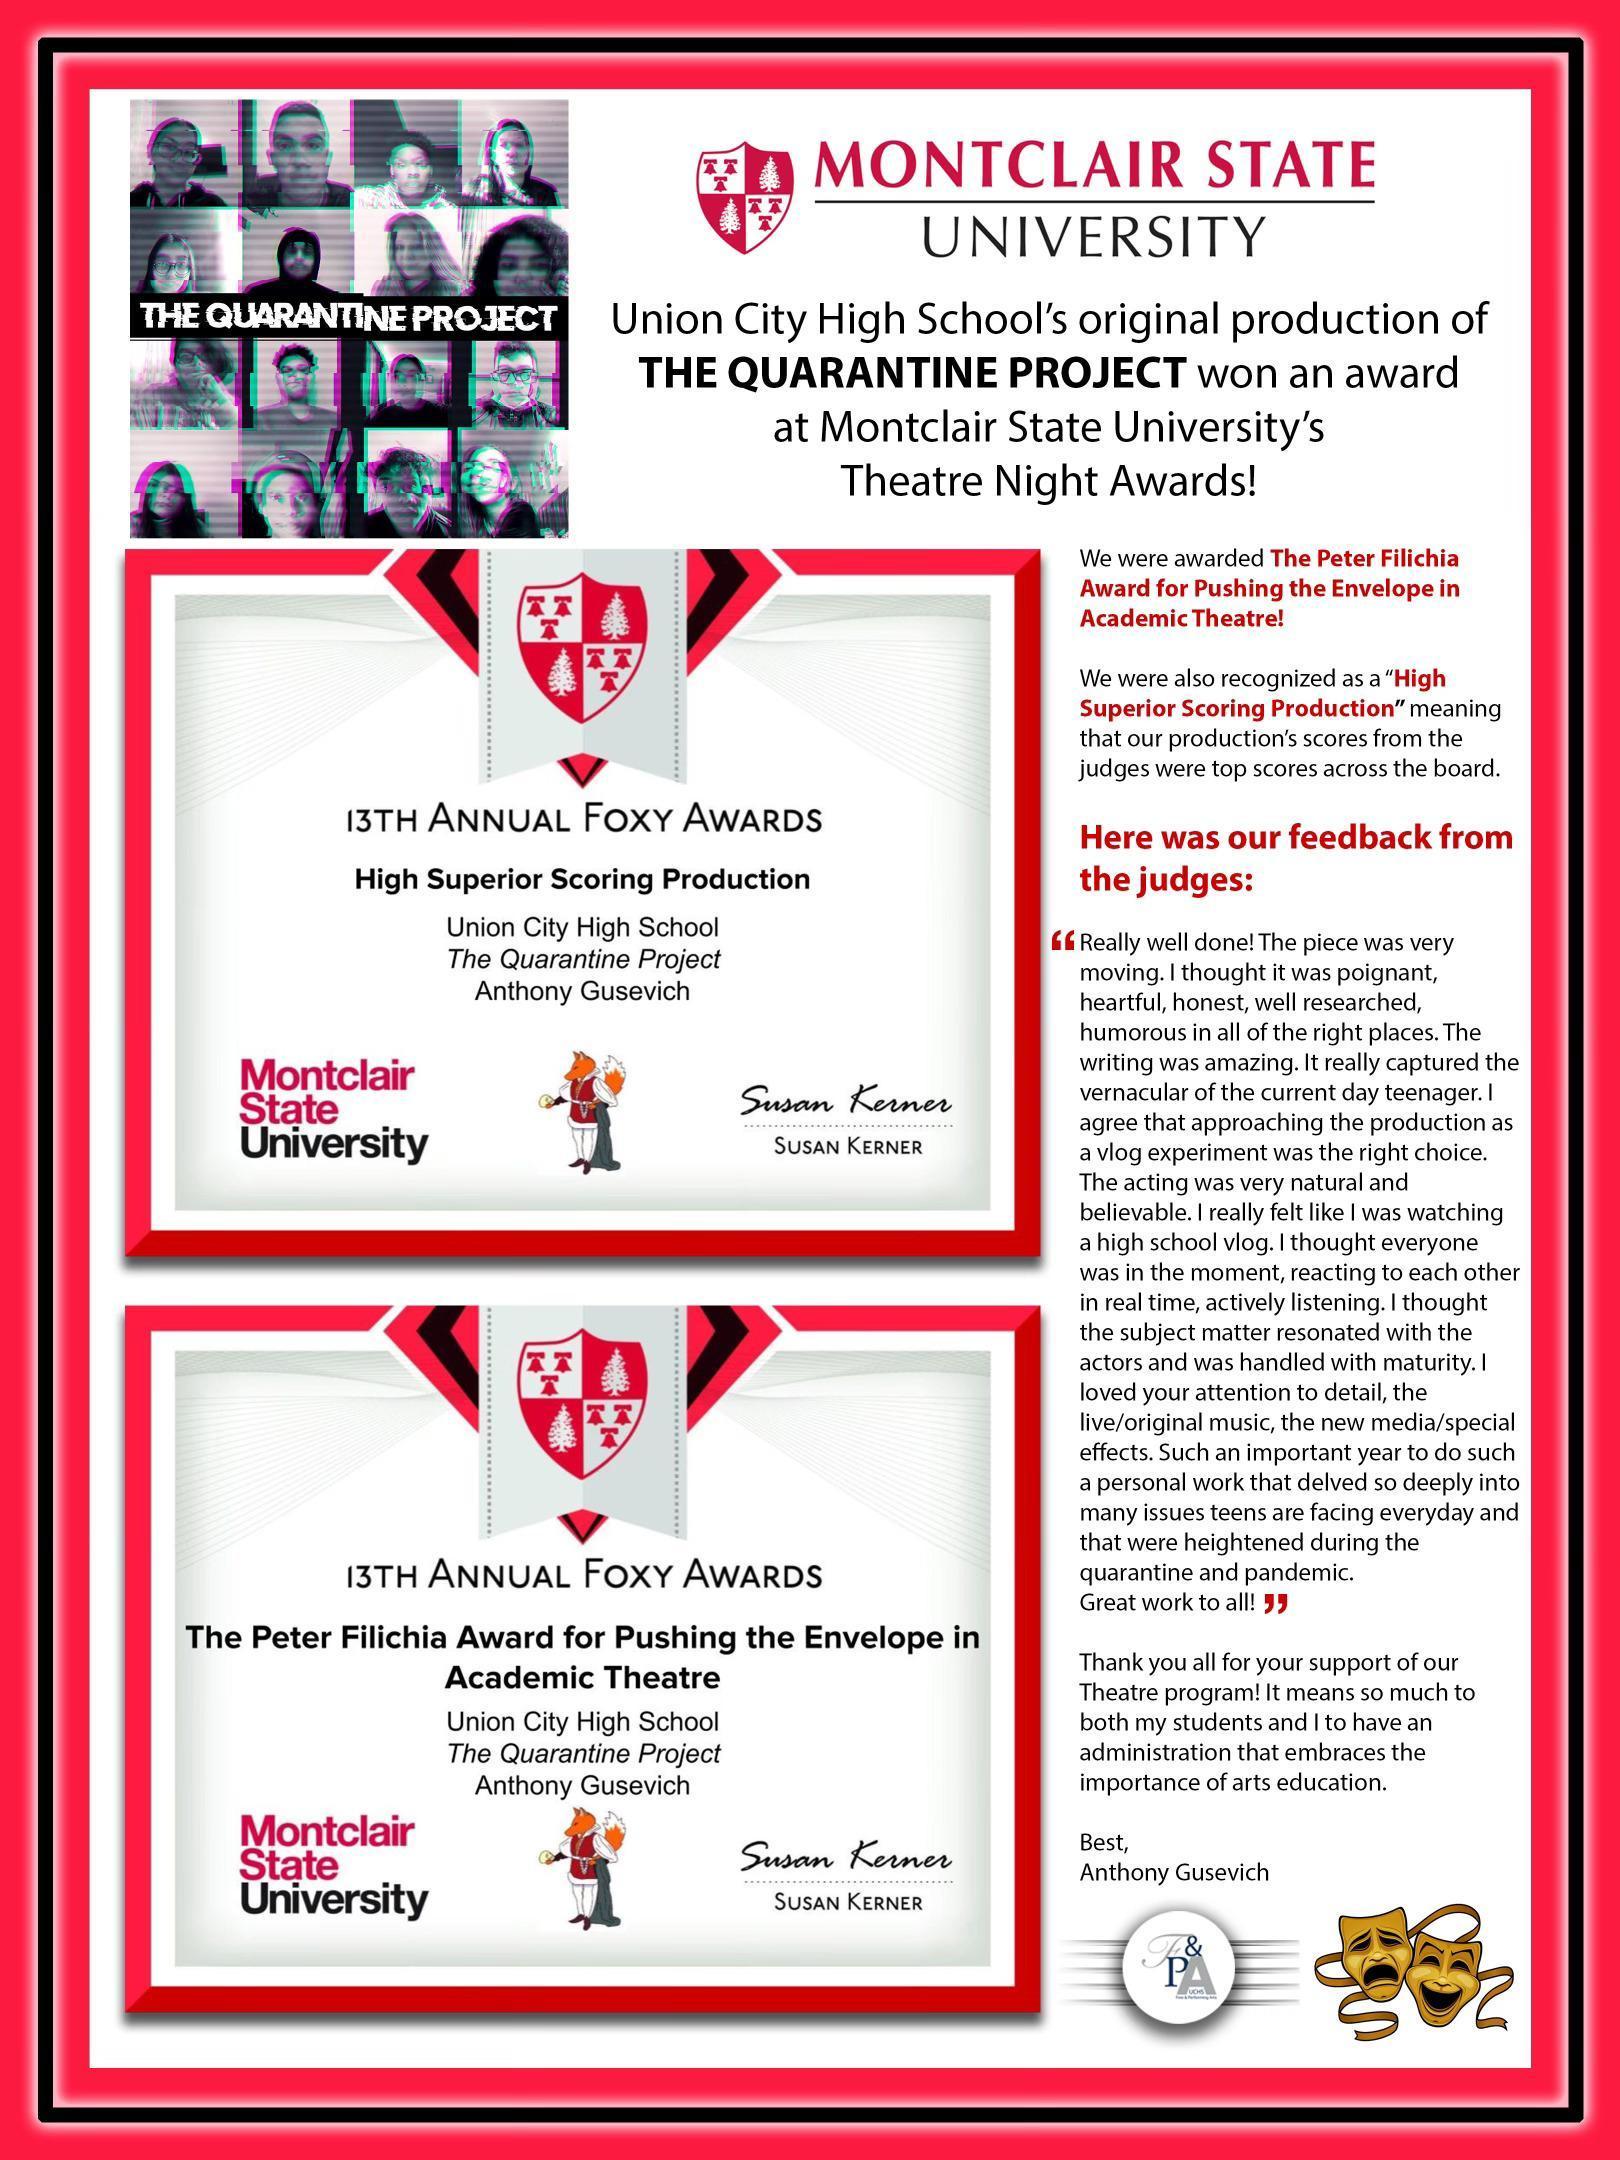 THE QUARANTINE PROJECT award information